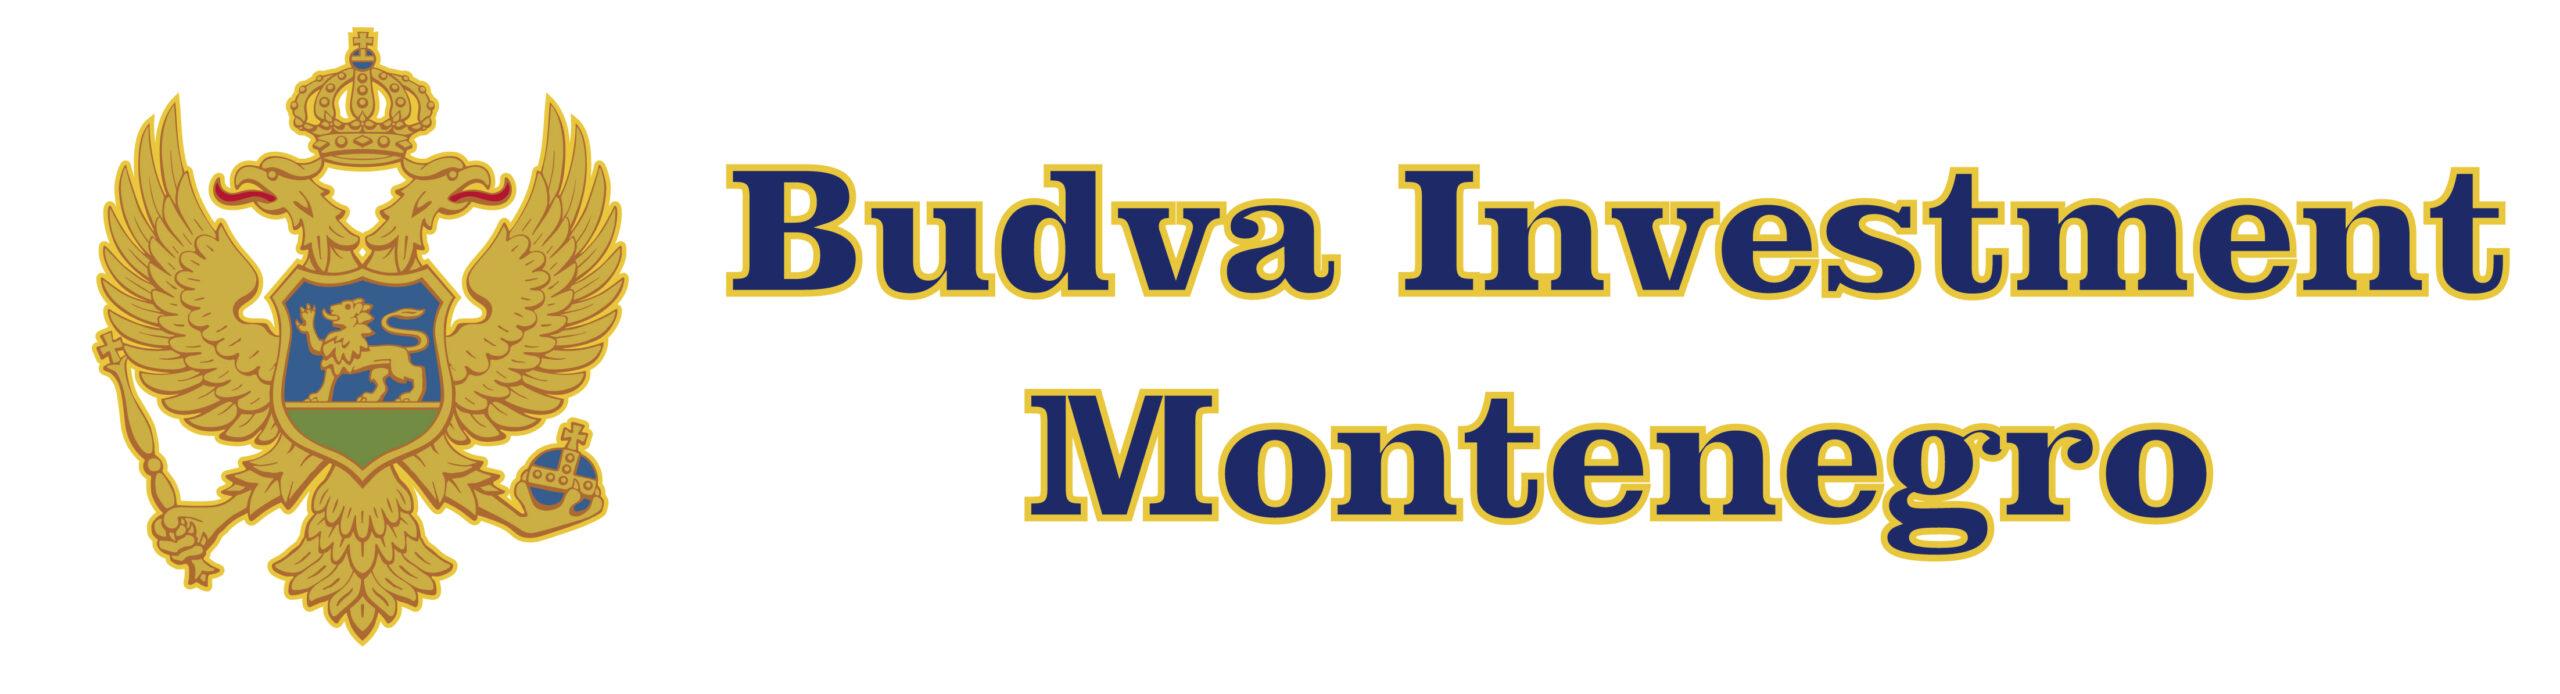 Budva Investment Montenegro